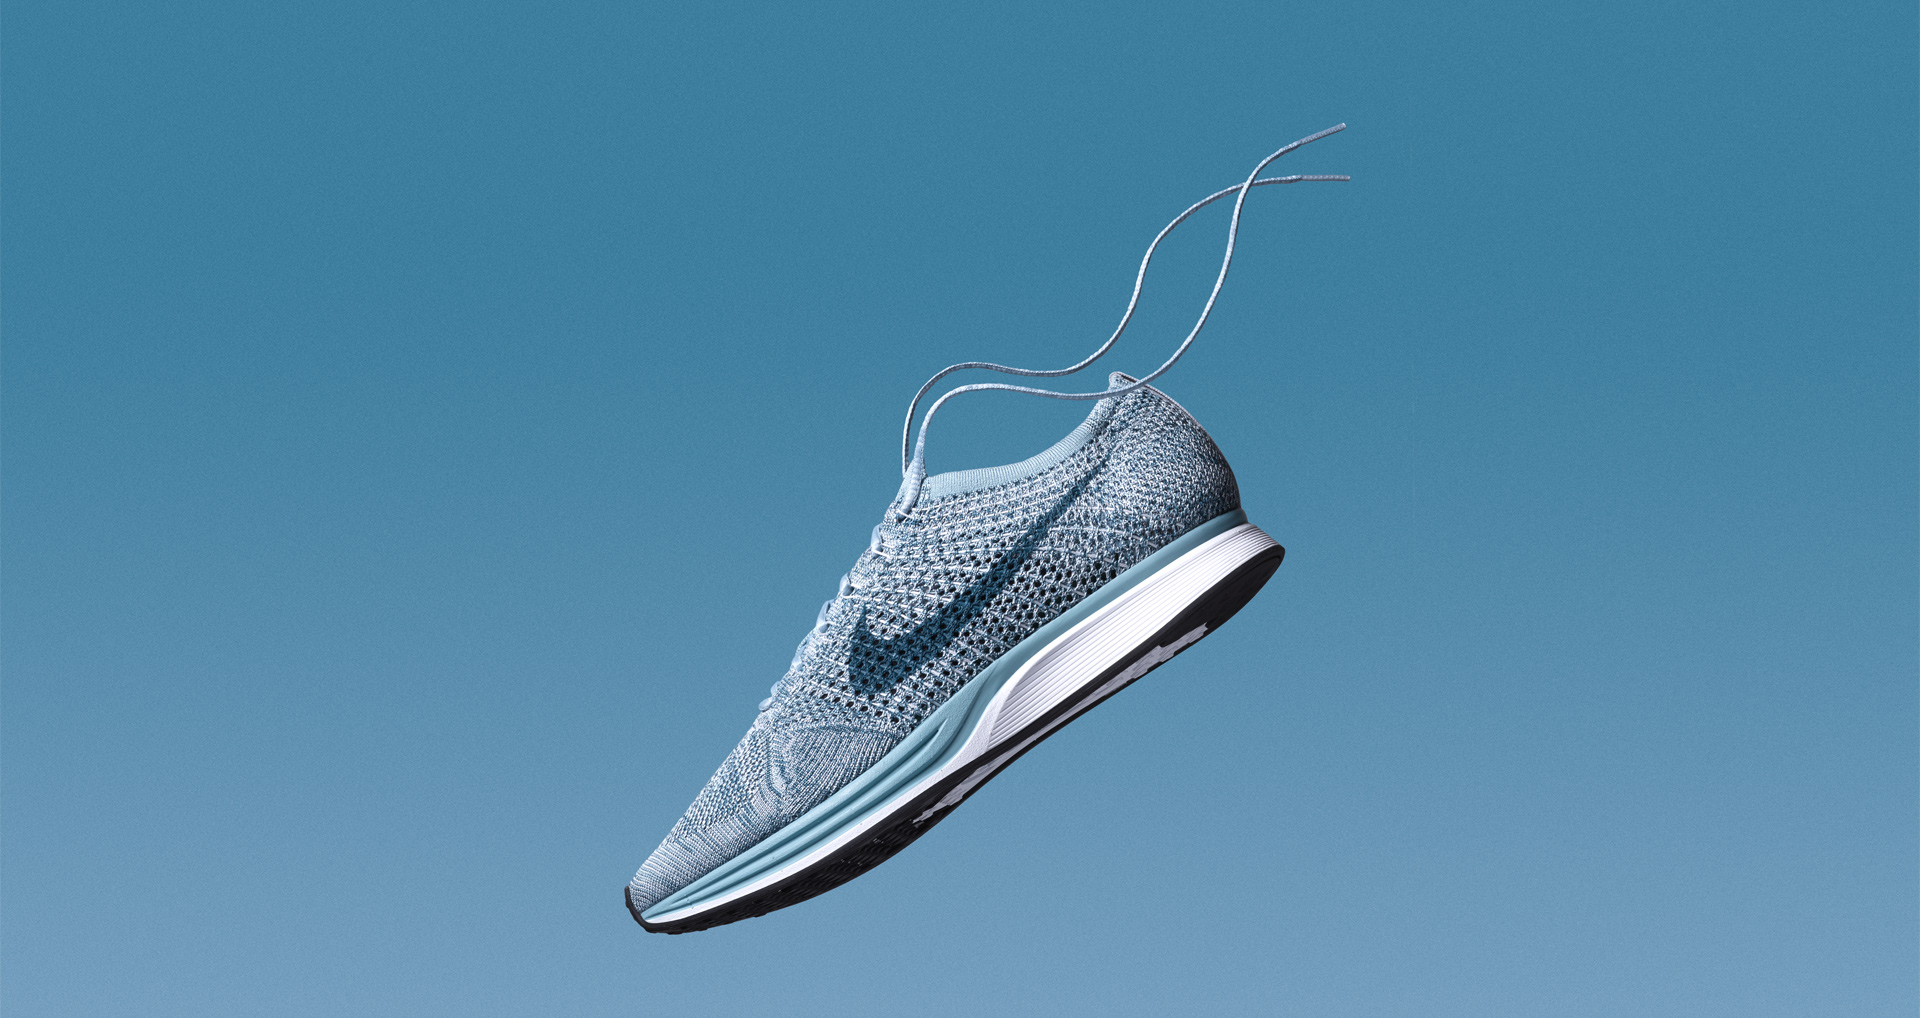 Nike Flyknit Racer Macaron Pack 4